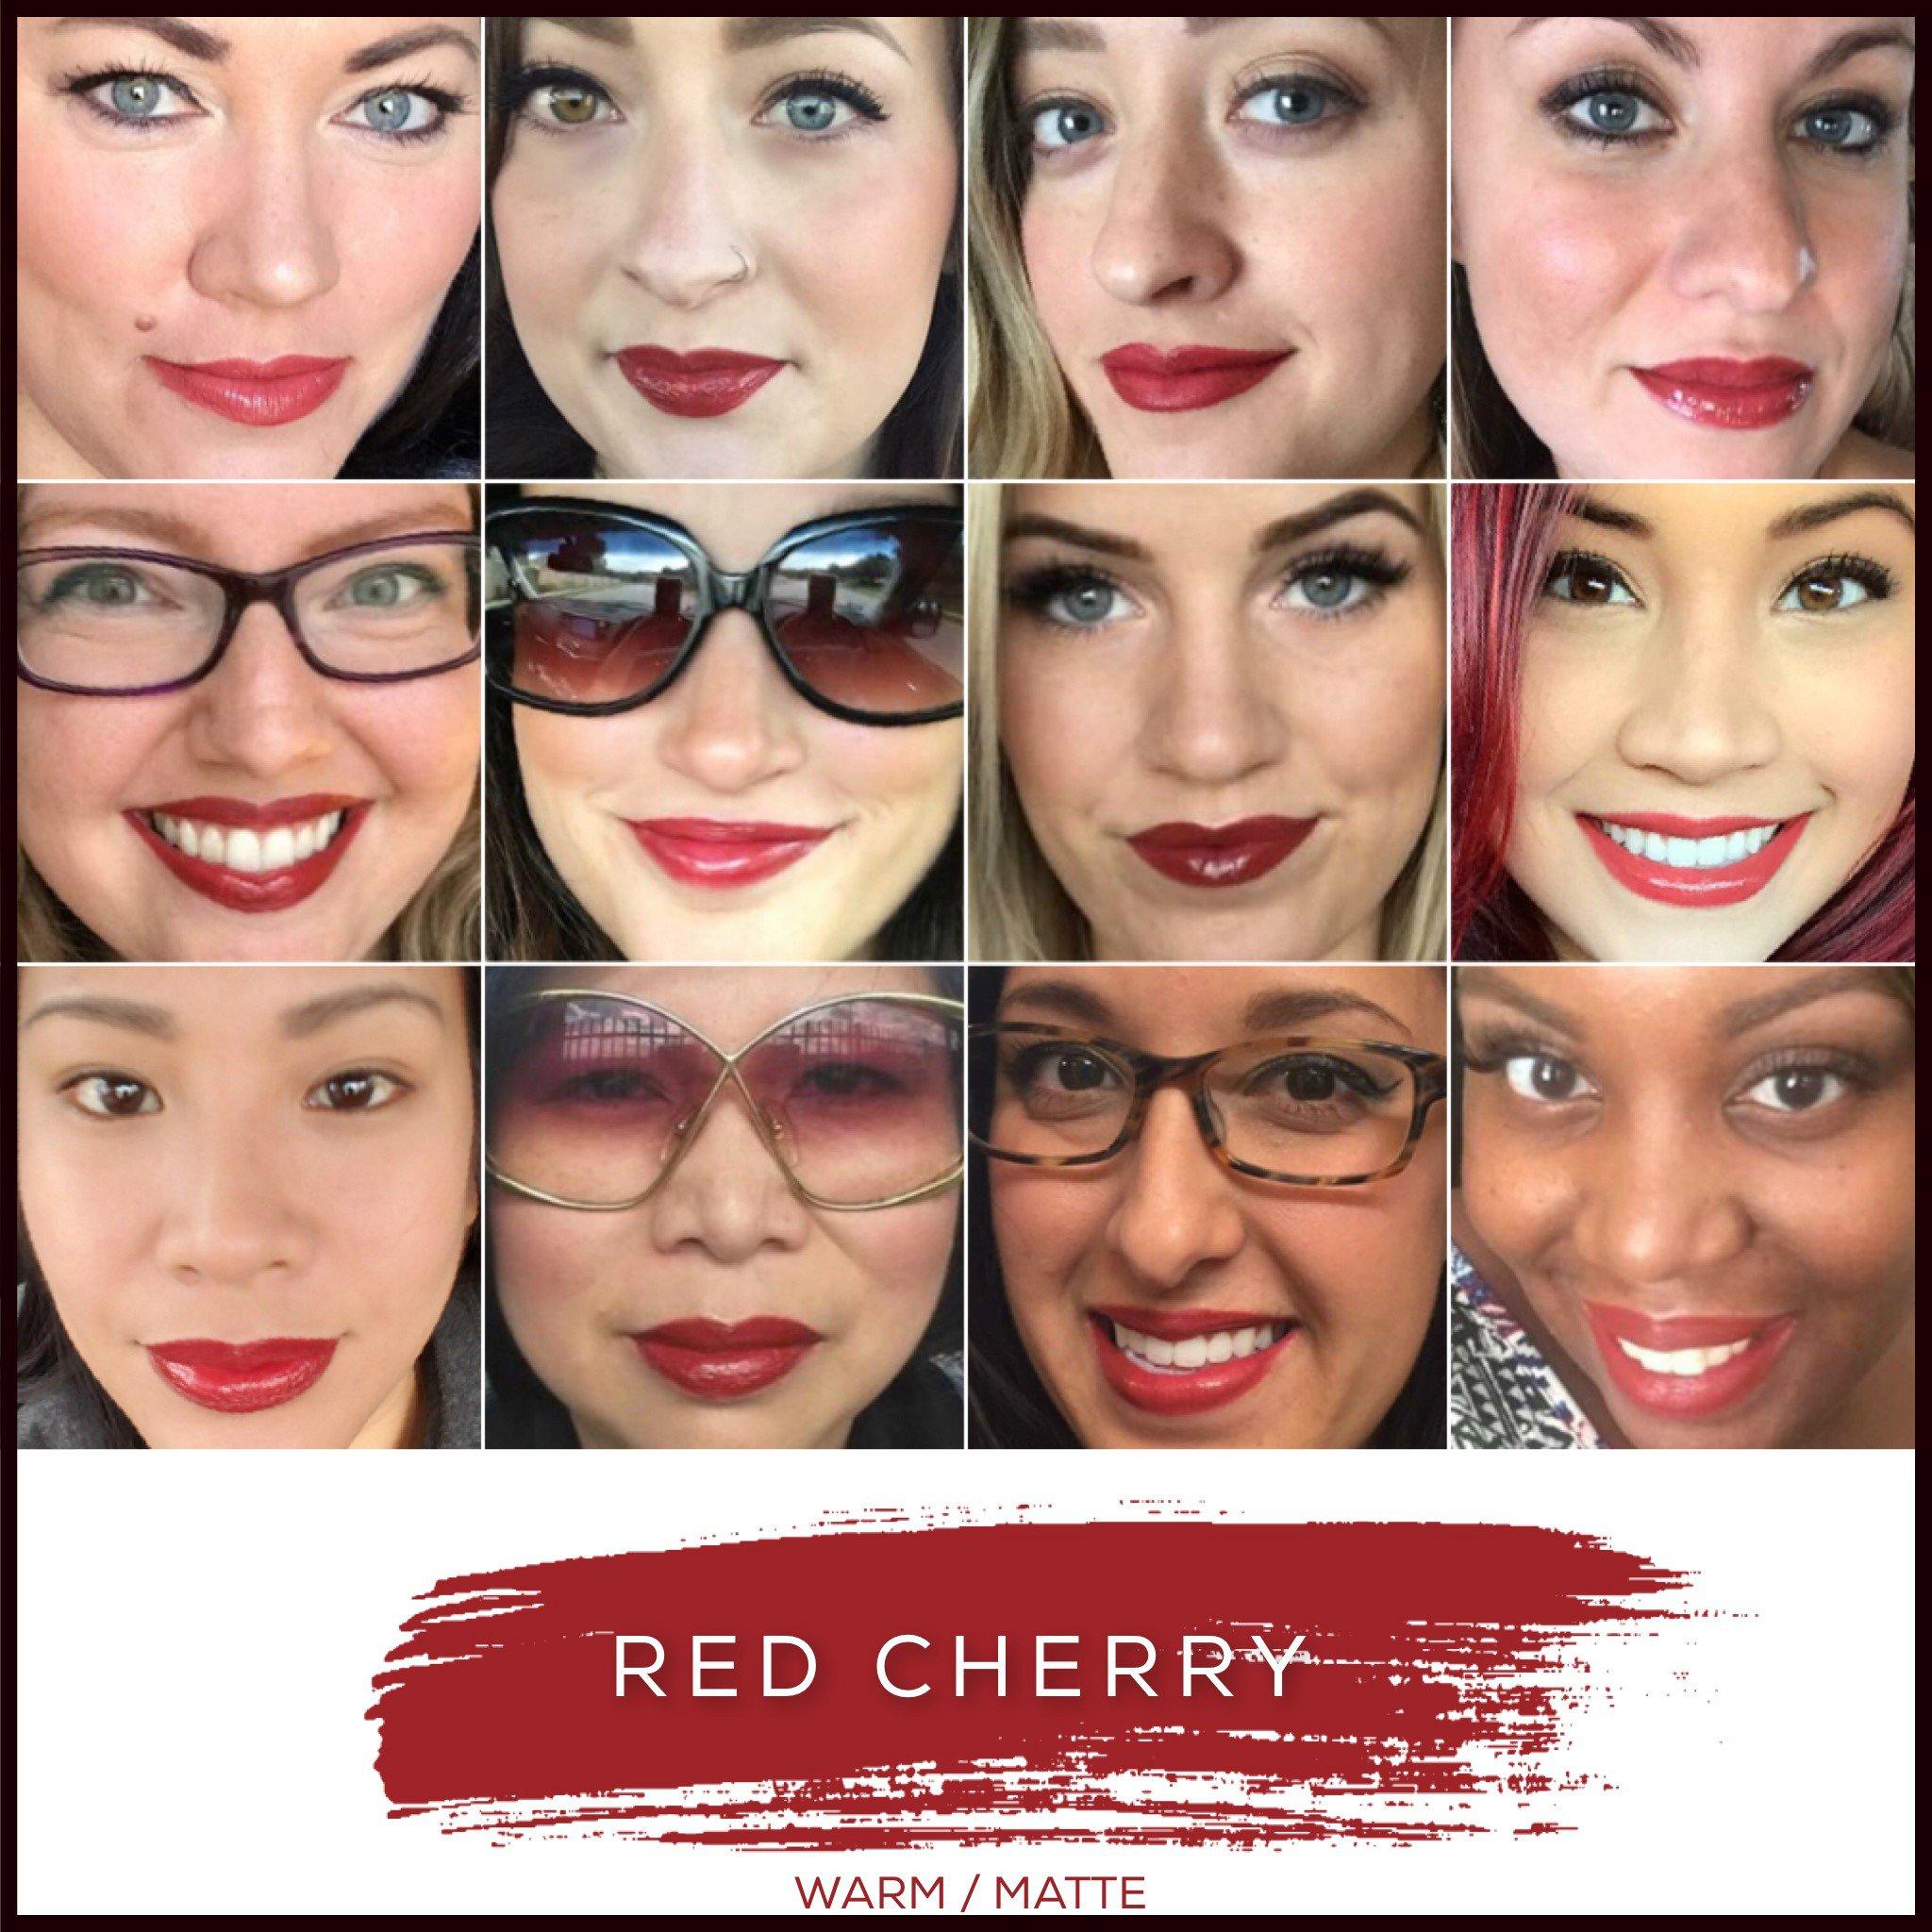 LipSense Bundle (Red Cherry) 1  Lip Color and 1 Glossy Gloss by LipSense